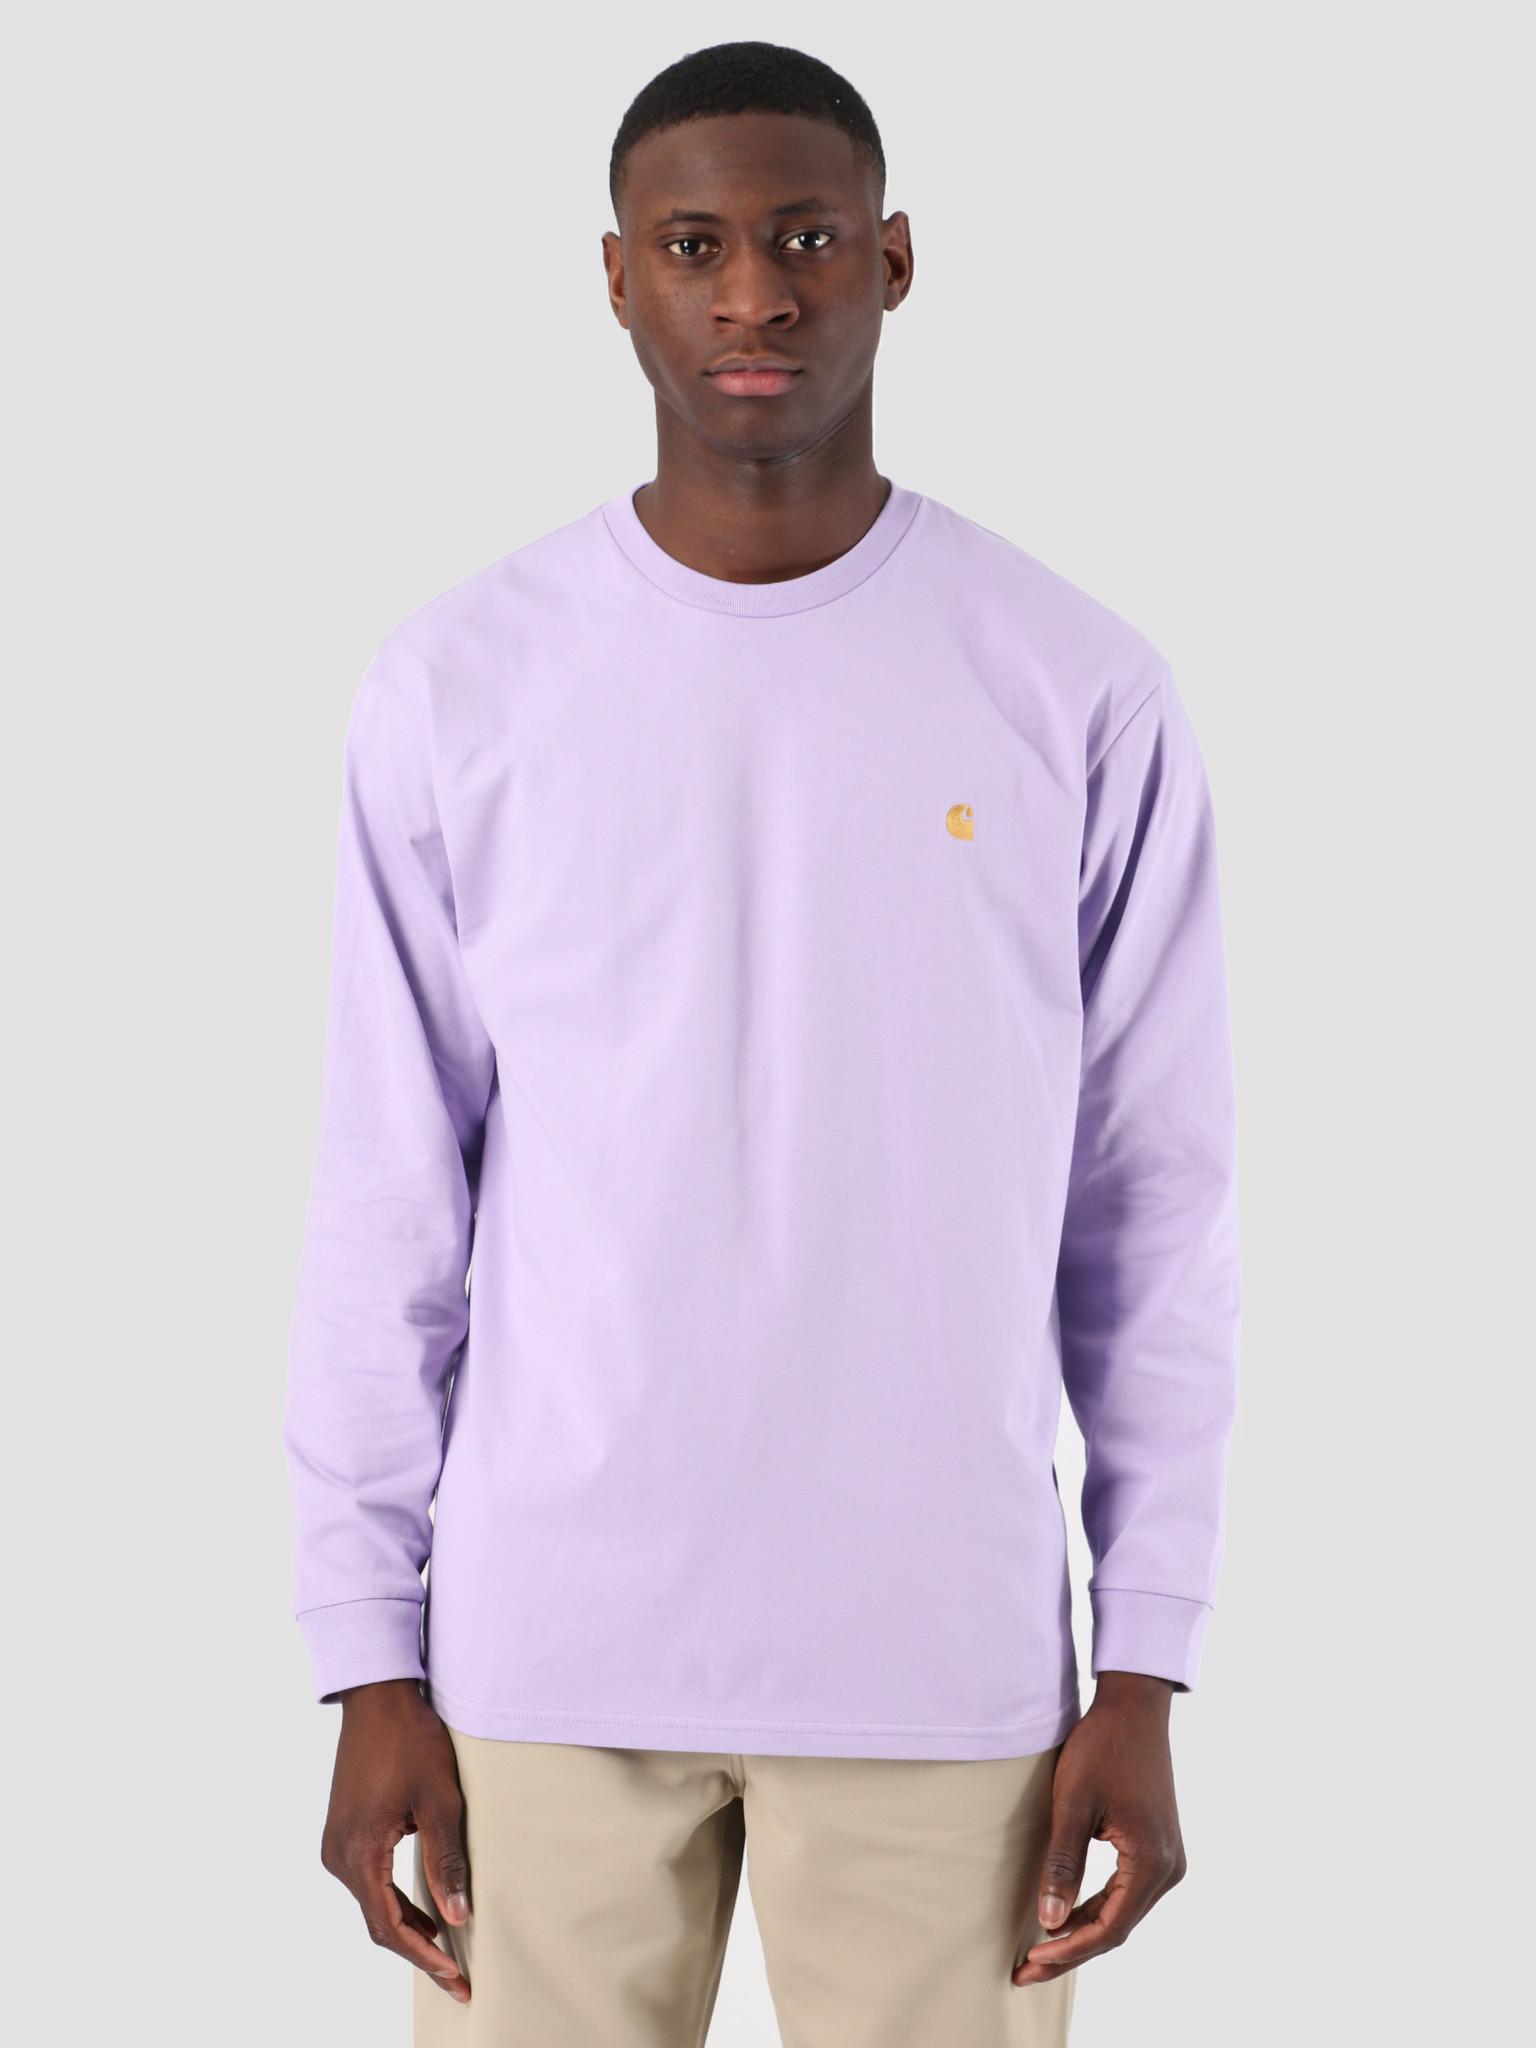 70a26b8d657 Carhartt WIP Carhartt WIP Long Sleeve Chase Shirt Soft Lavender Gold  61091000